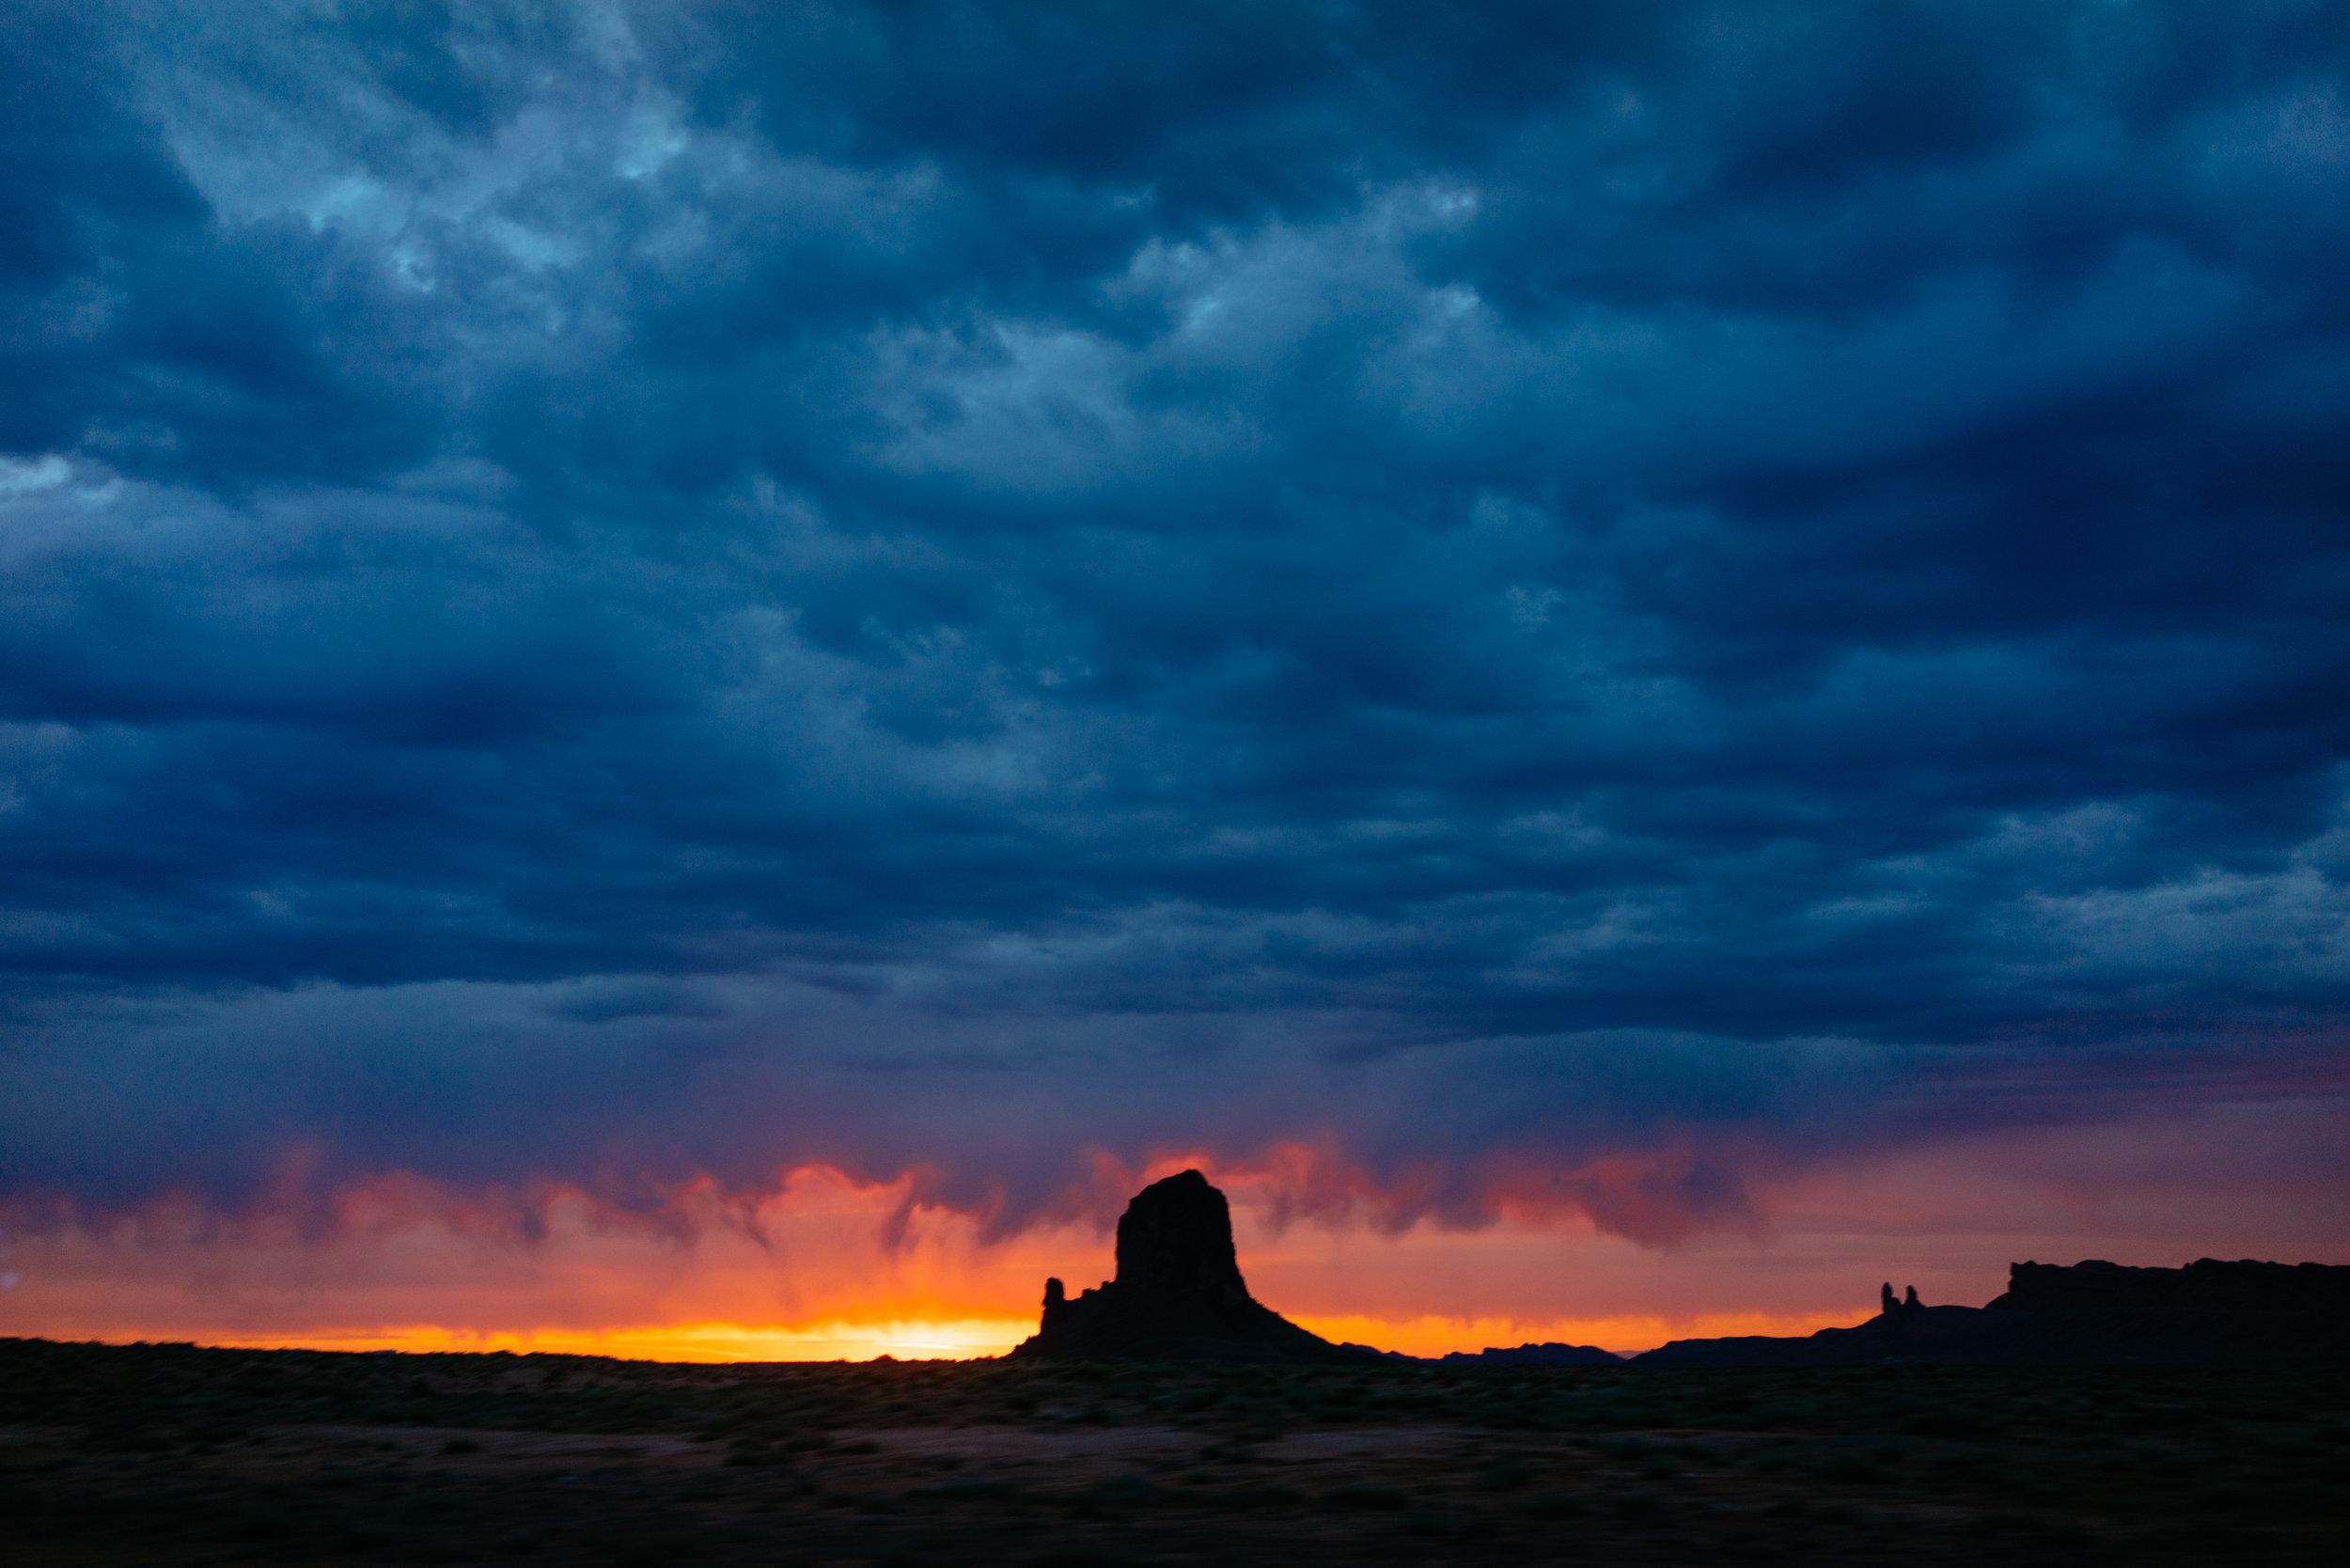 Sunrise on over Monument Valley, Arizona